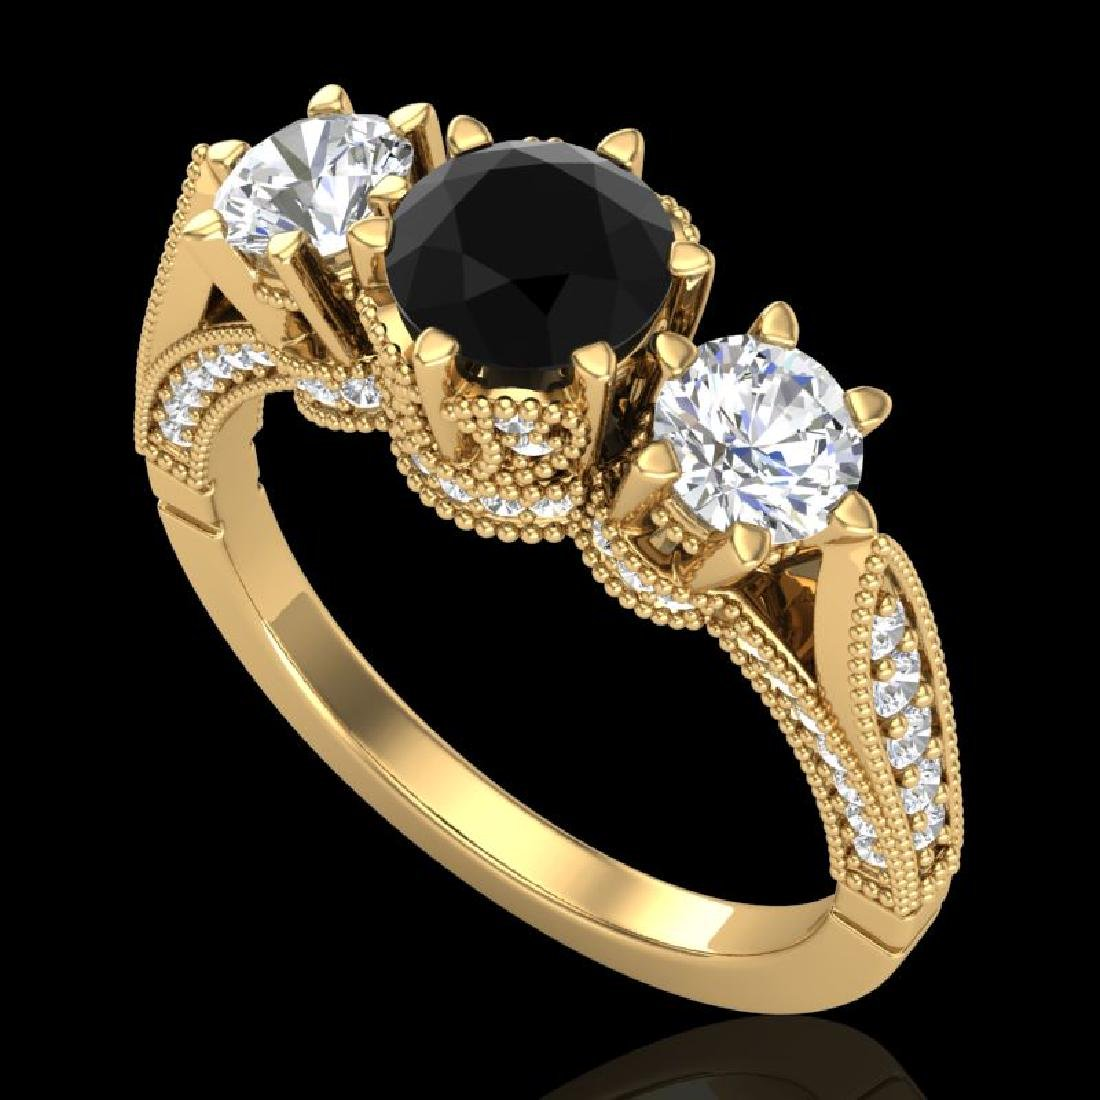 2.18 CTW Fancy Black Diamond Solitaire Art Deco 3 Stone